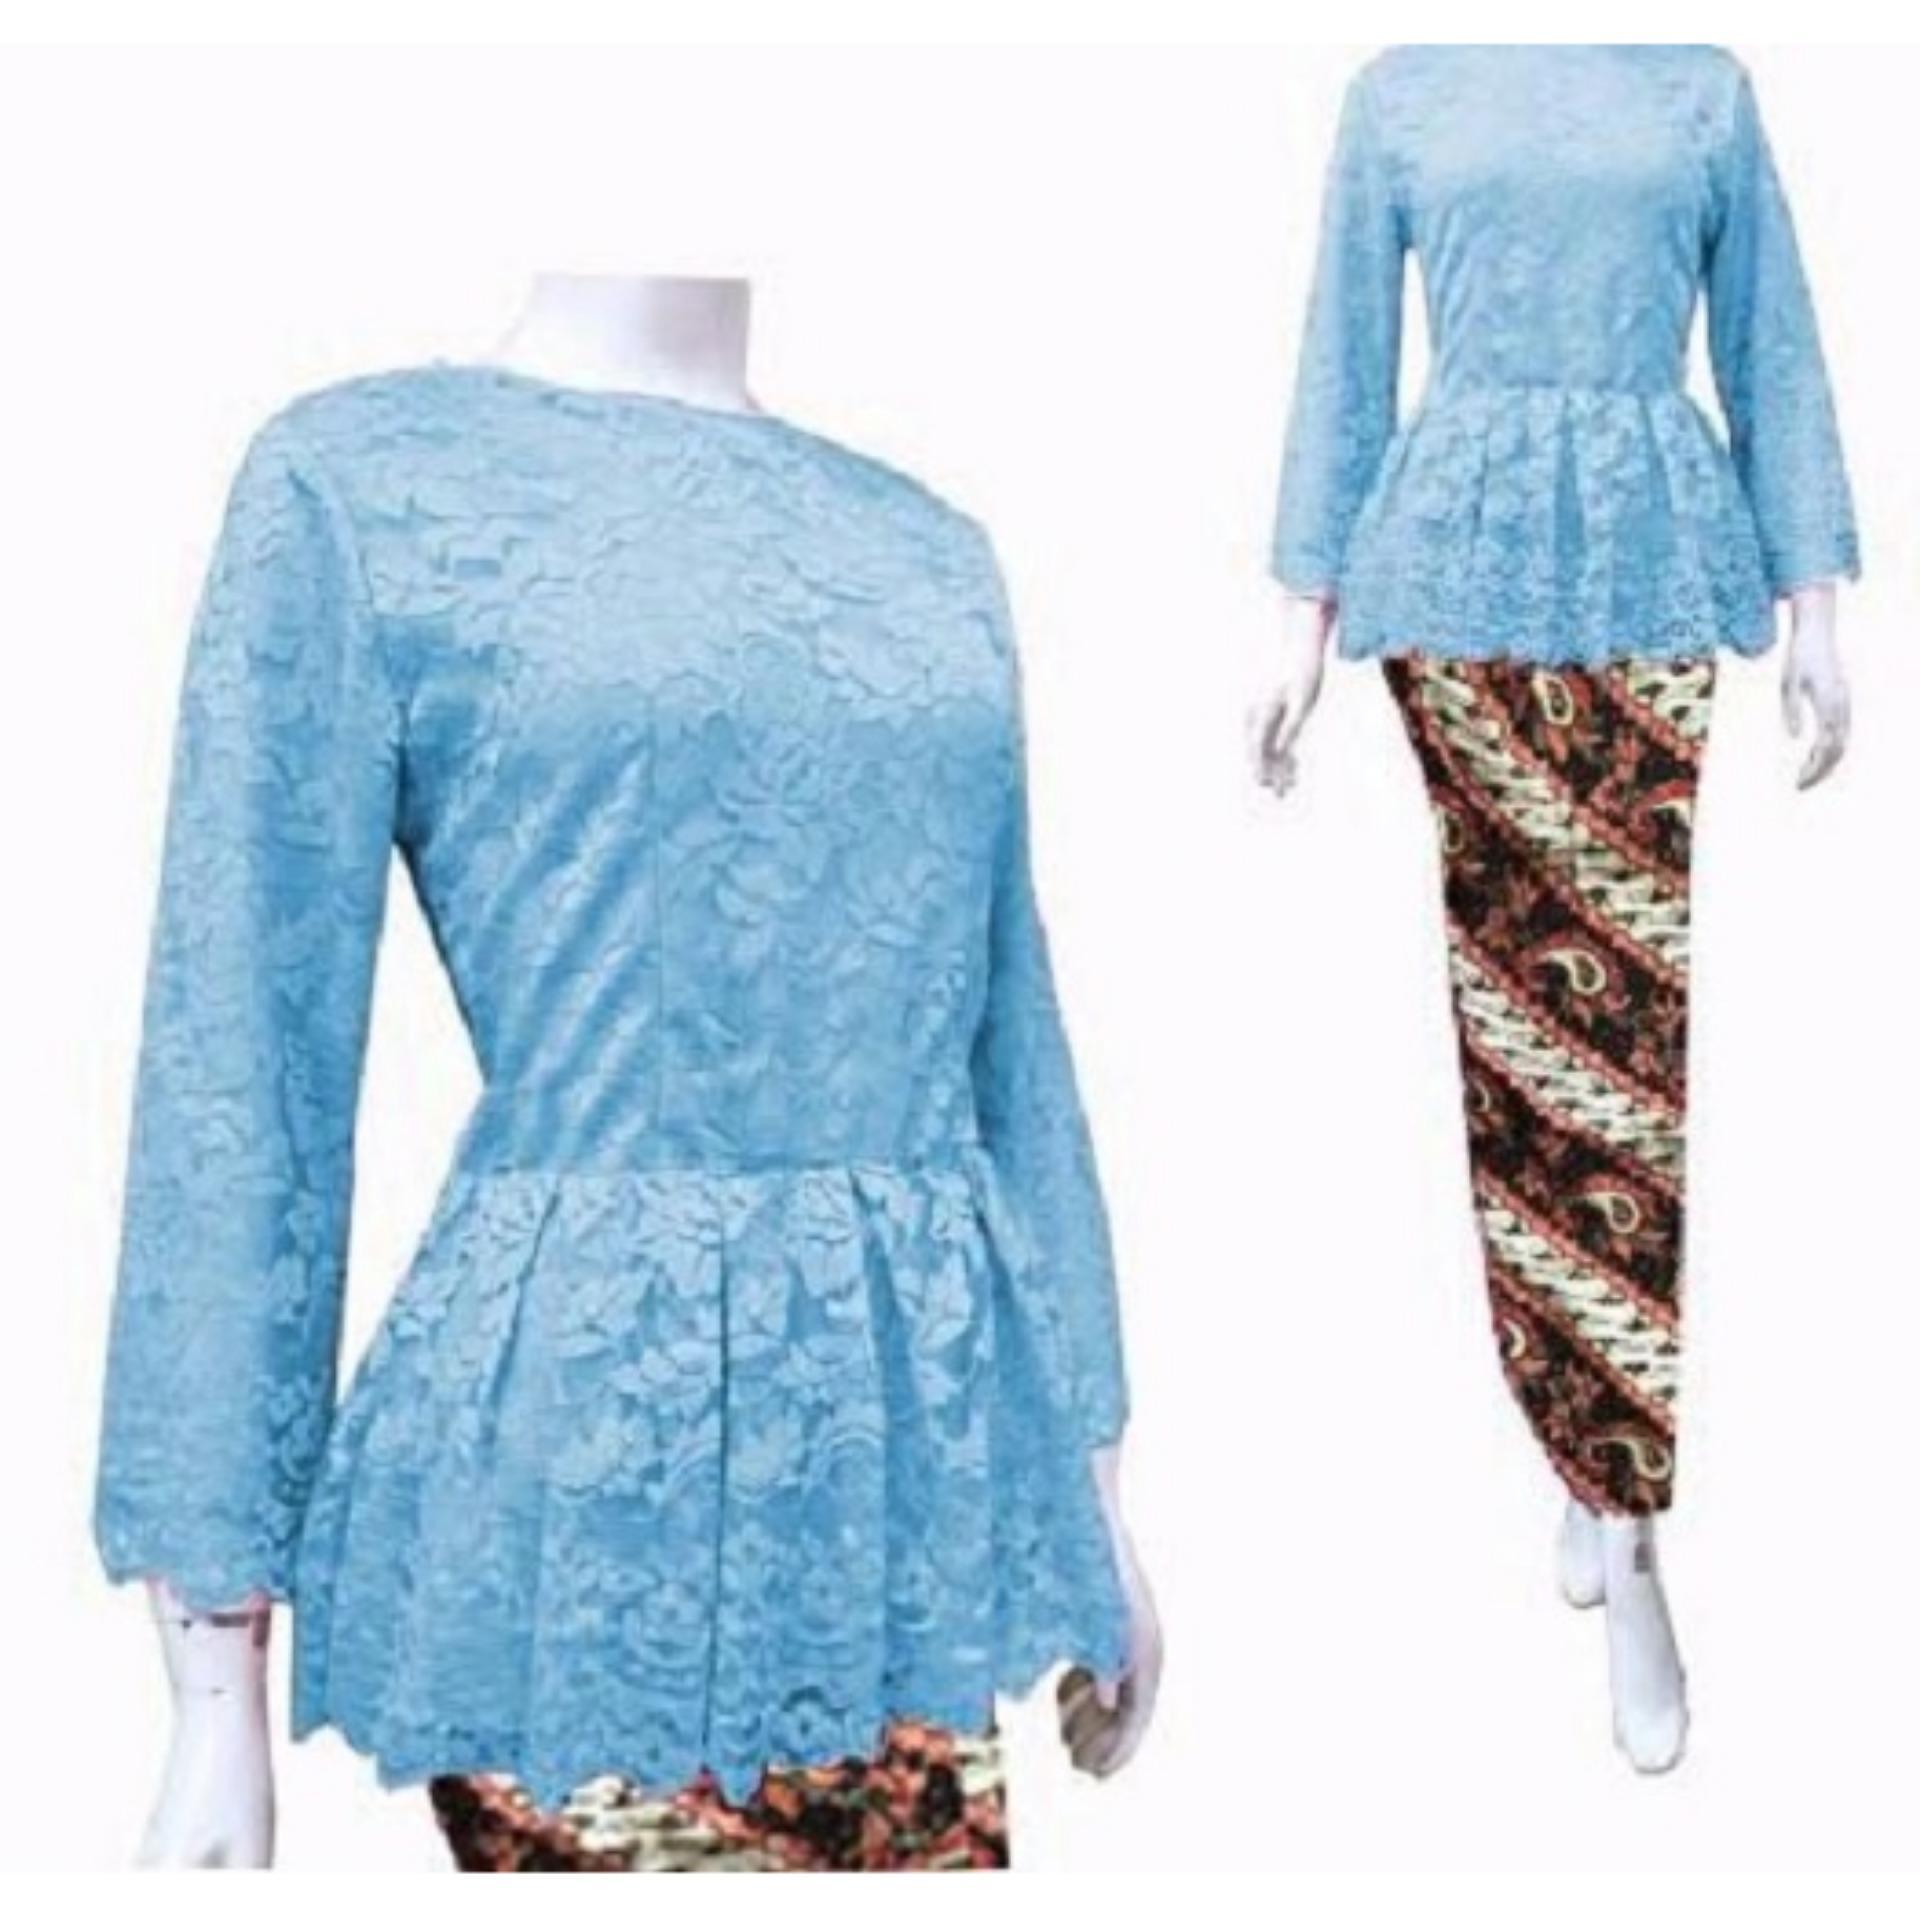 Buy Sell Cheapest Amorshop Setelan Farasya Best Quality Product Elsheskin X Tasya Pakaian Wanita Brukat Dan Batik